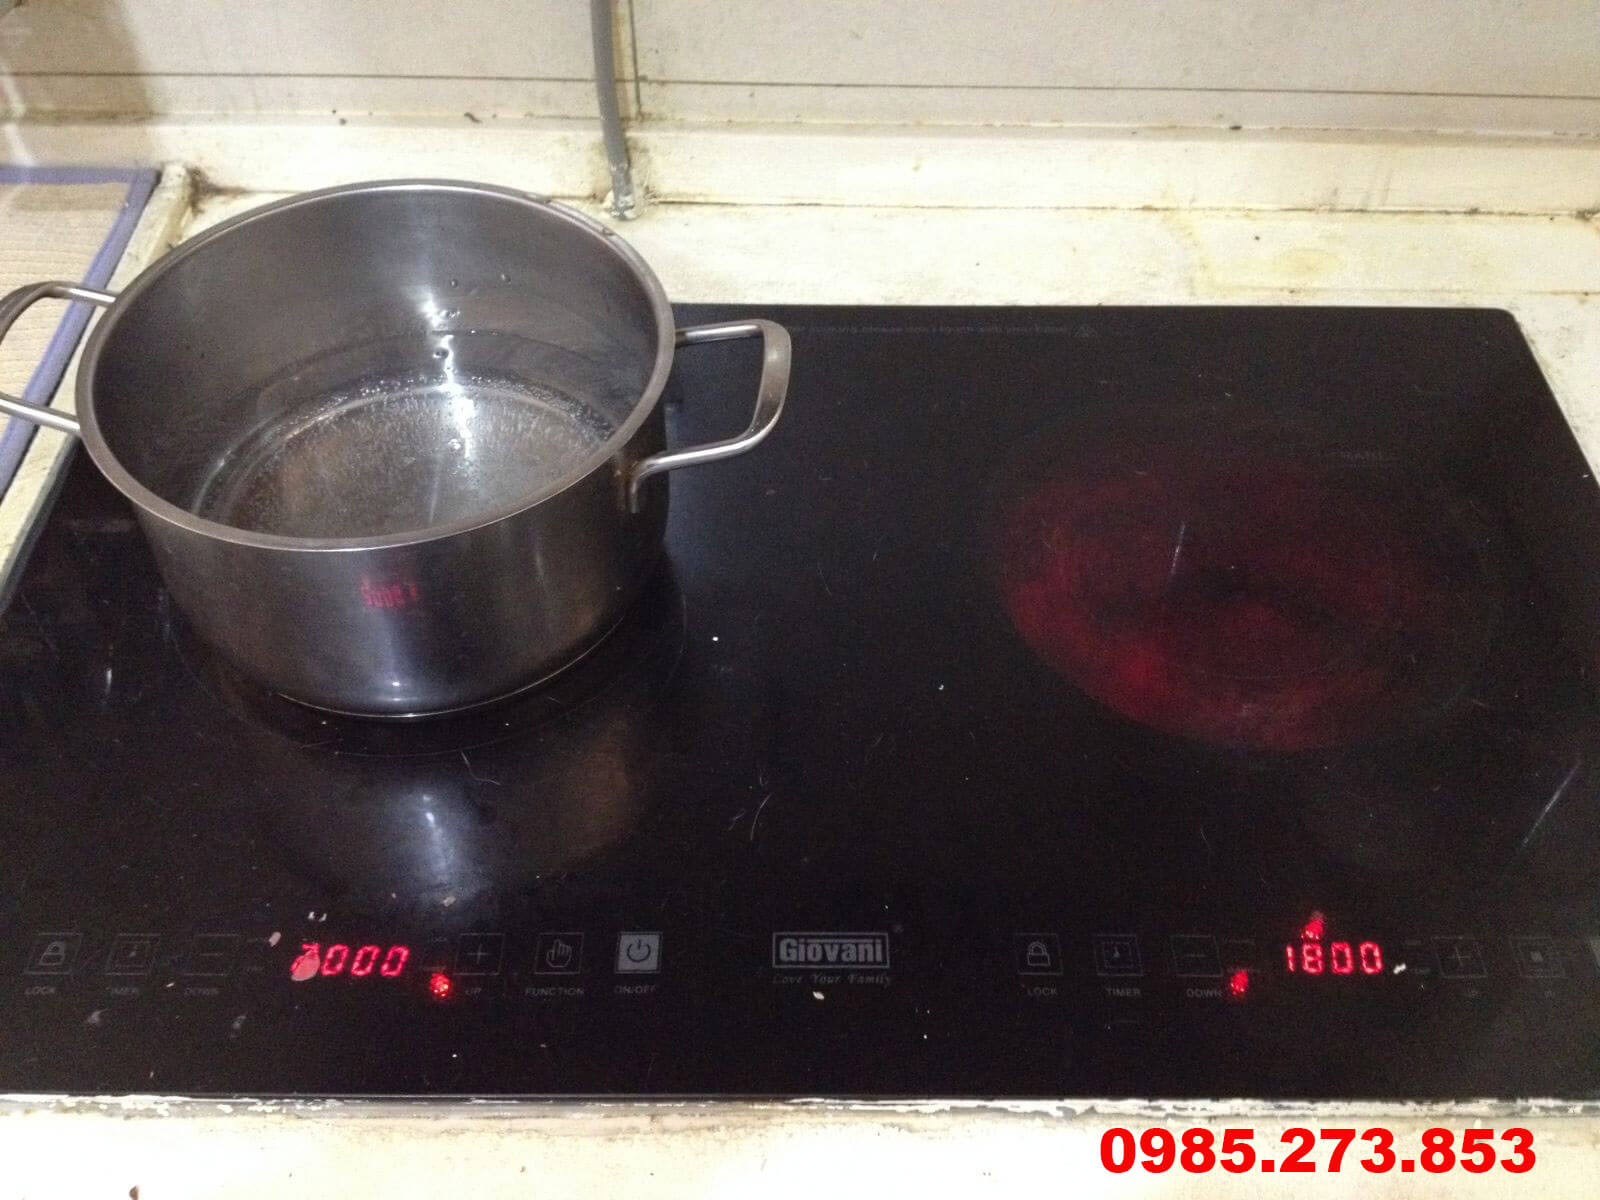 Sửa bếp từ Giovani